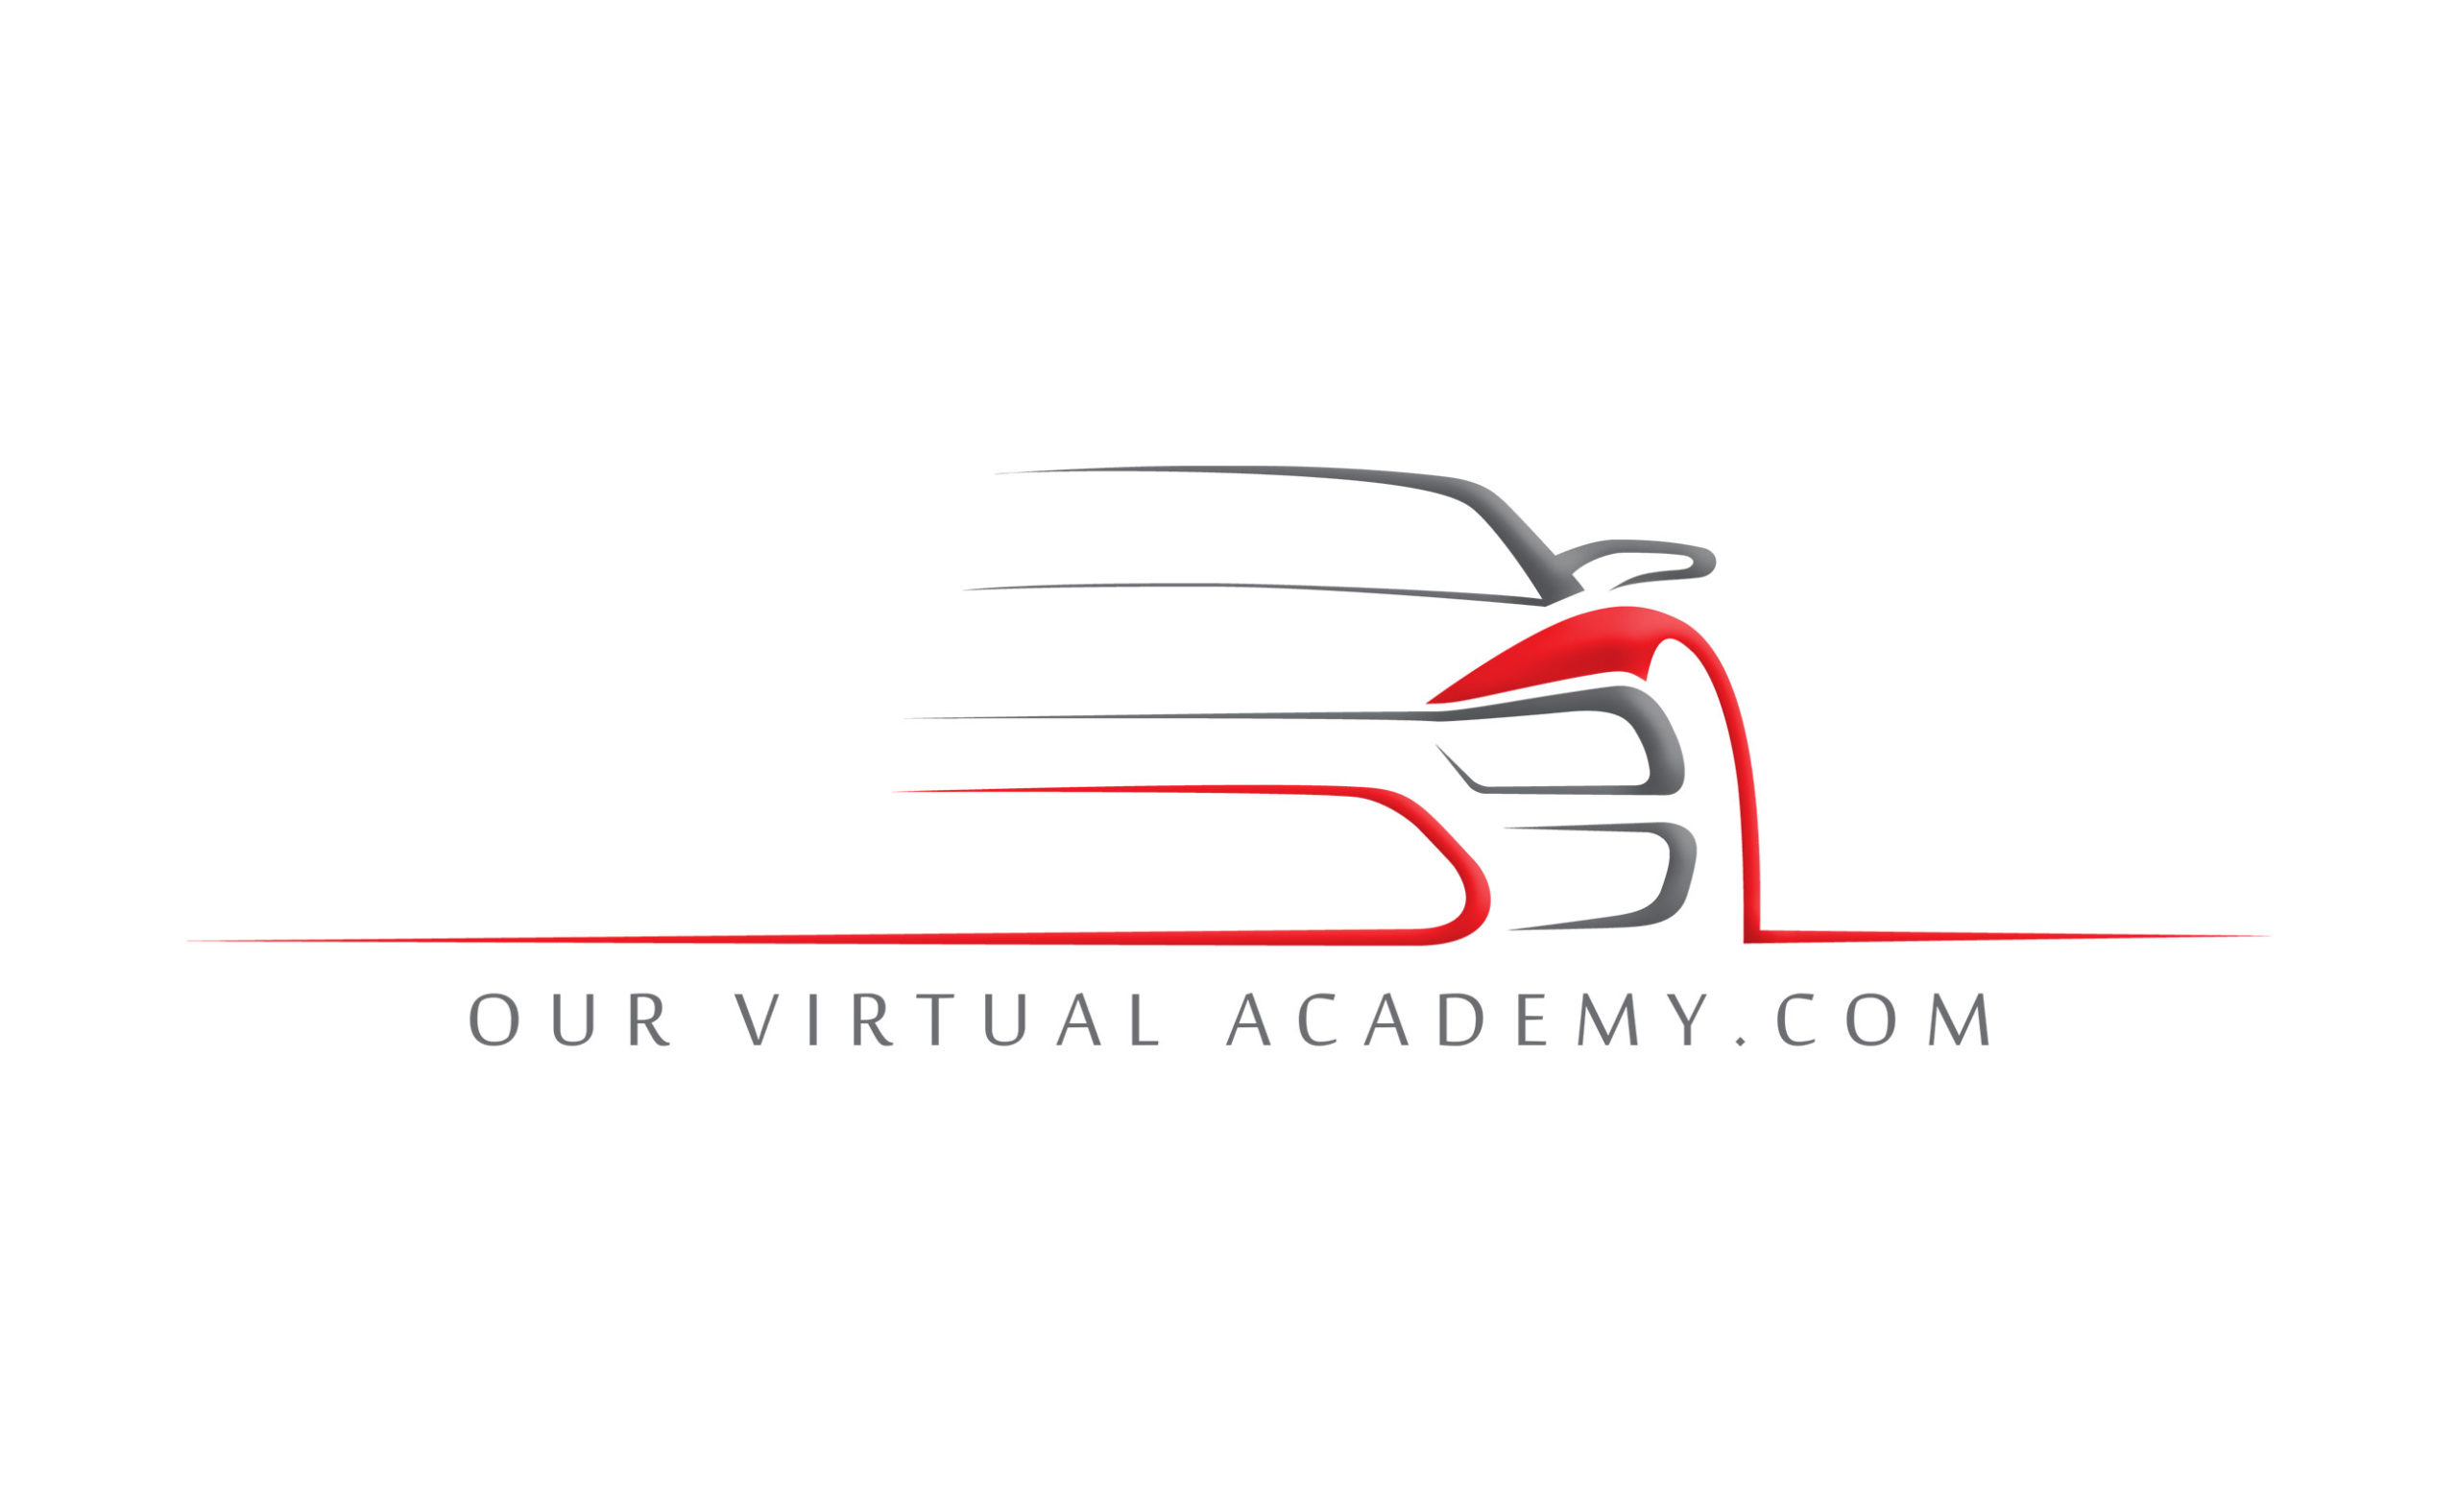 Our Virtual Academy